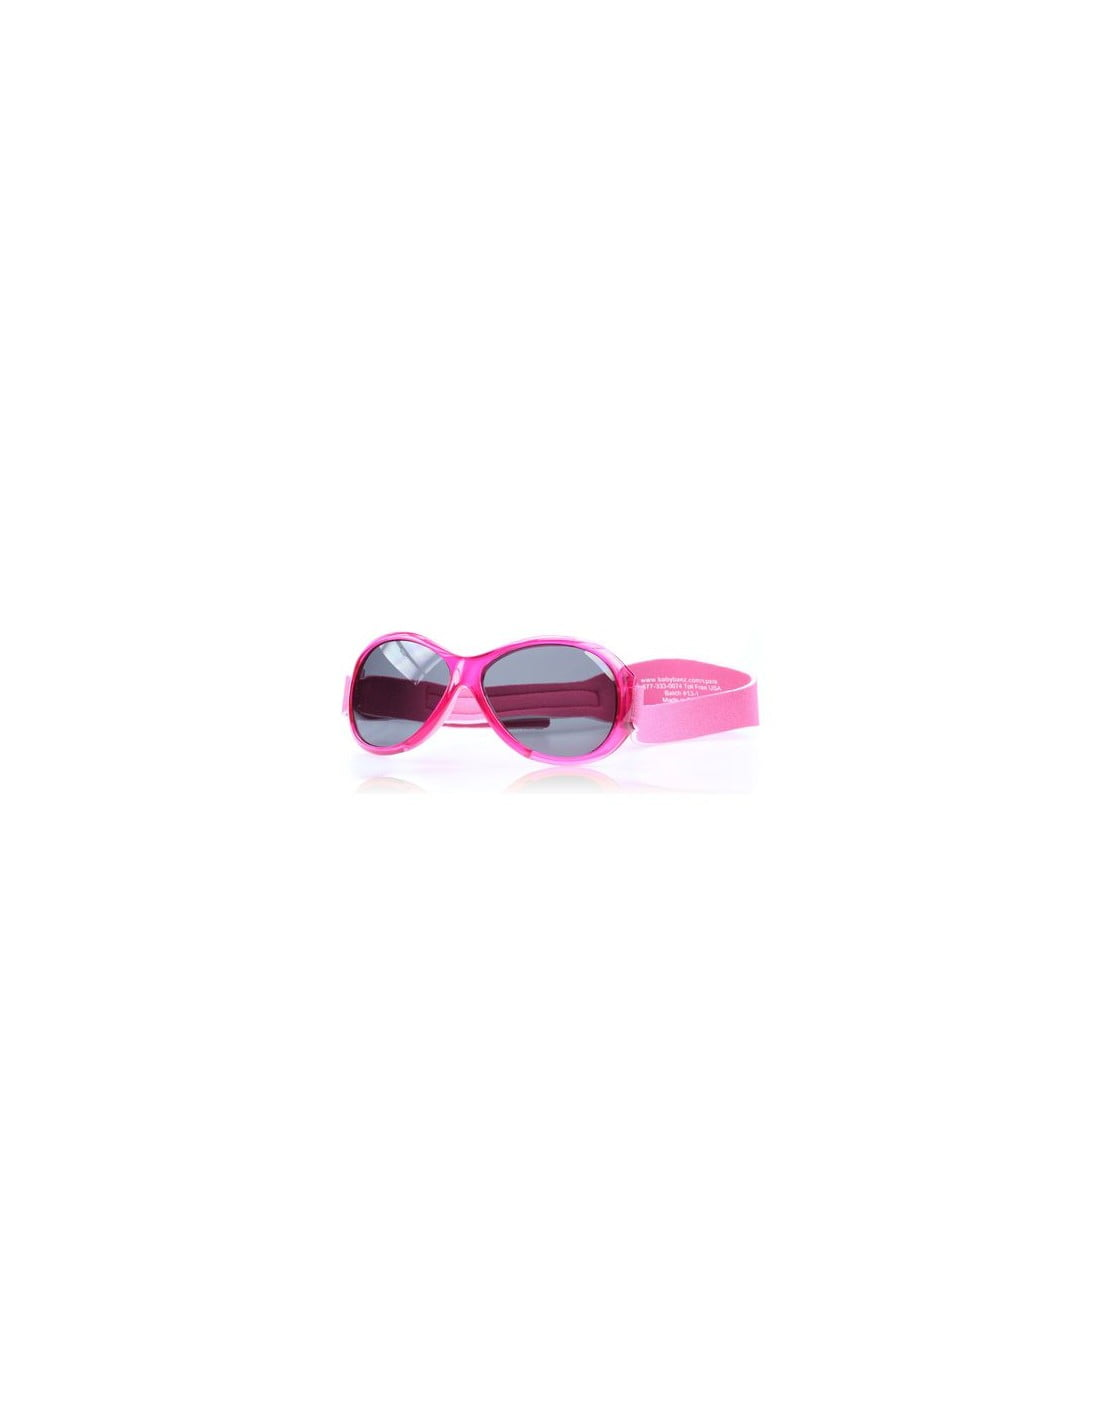 Ochelari de soare Bebe 0-2 ani Retro Oval Pink Banz